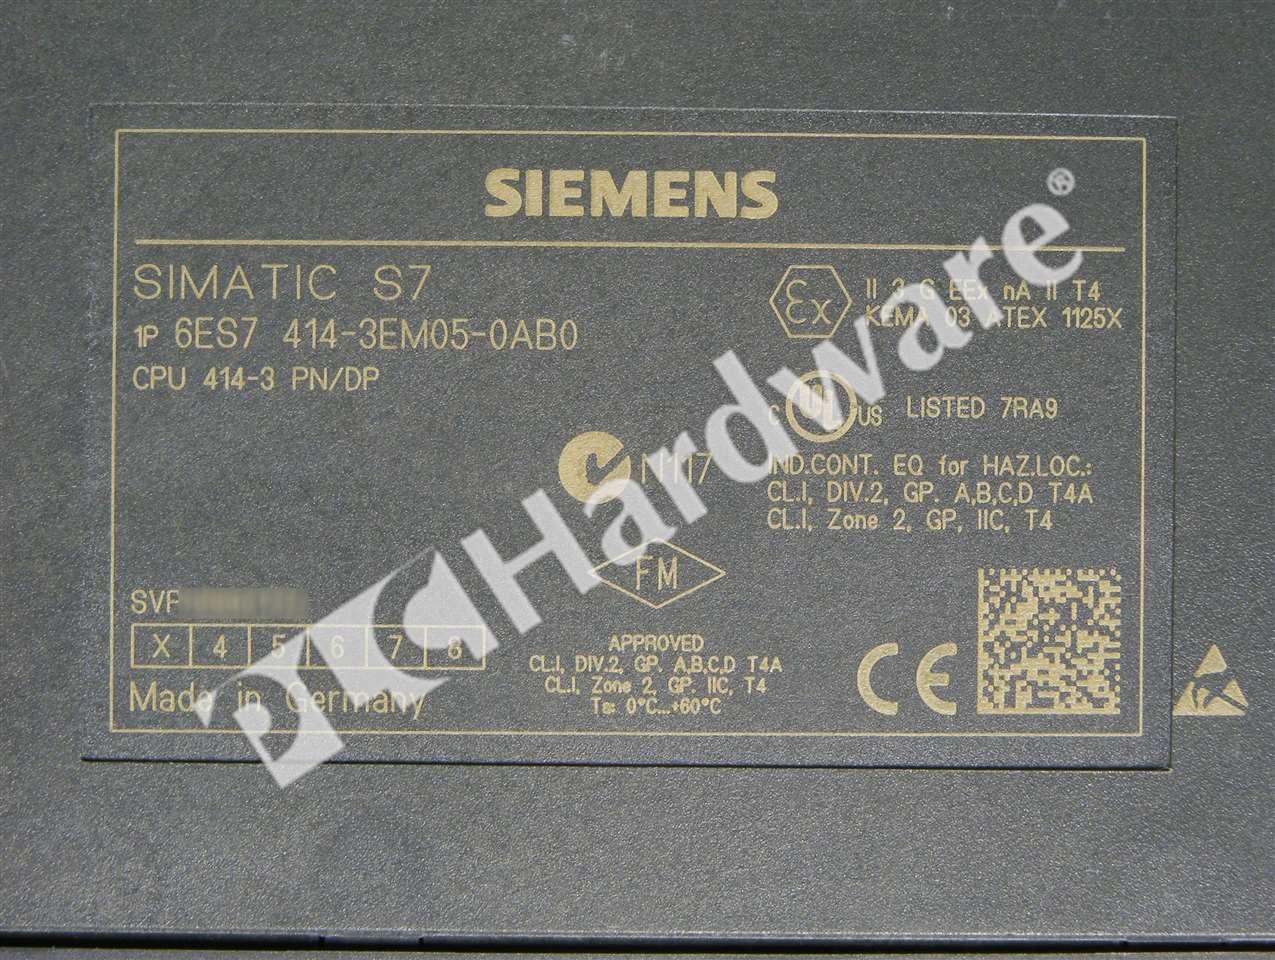 Details about Siemens 6ES7414-3EM05-0AB0 E-Stand 3 6ES7 414-3EM05-0AB0  S7-400 CPU 414-3 PN/DP